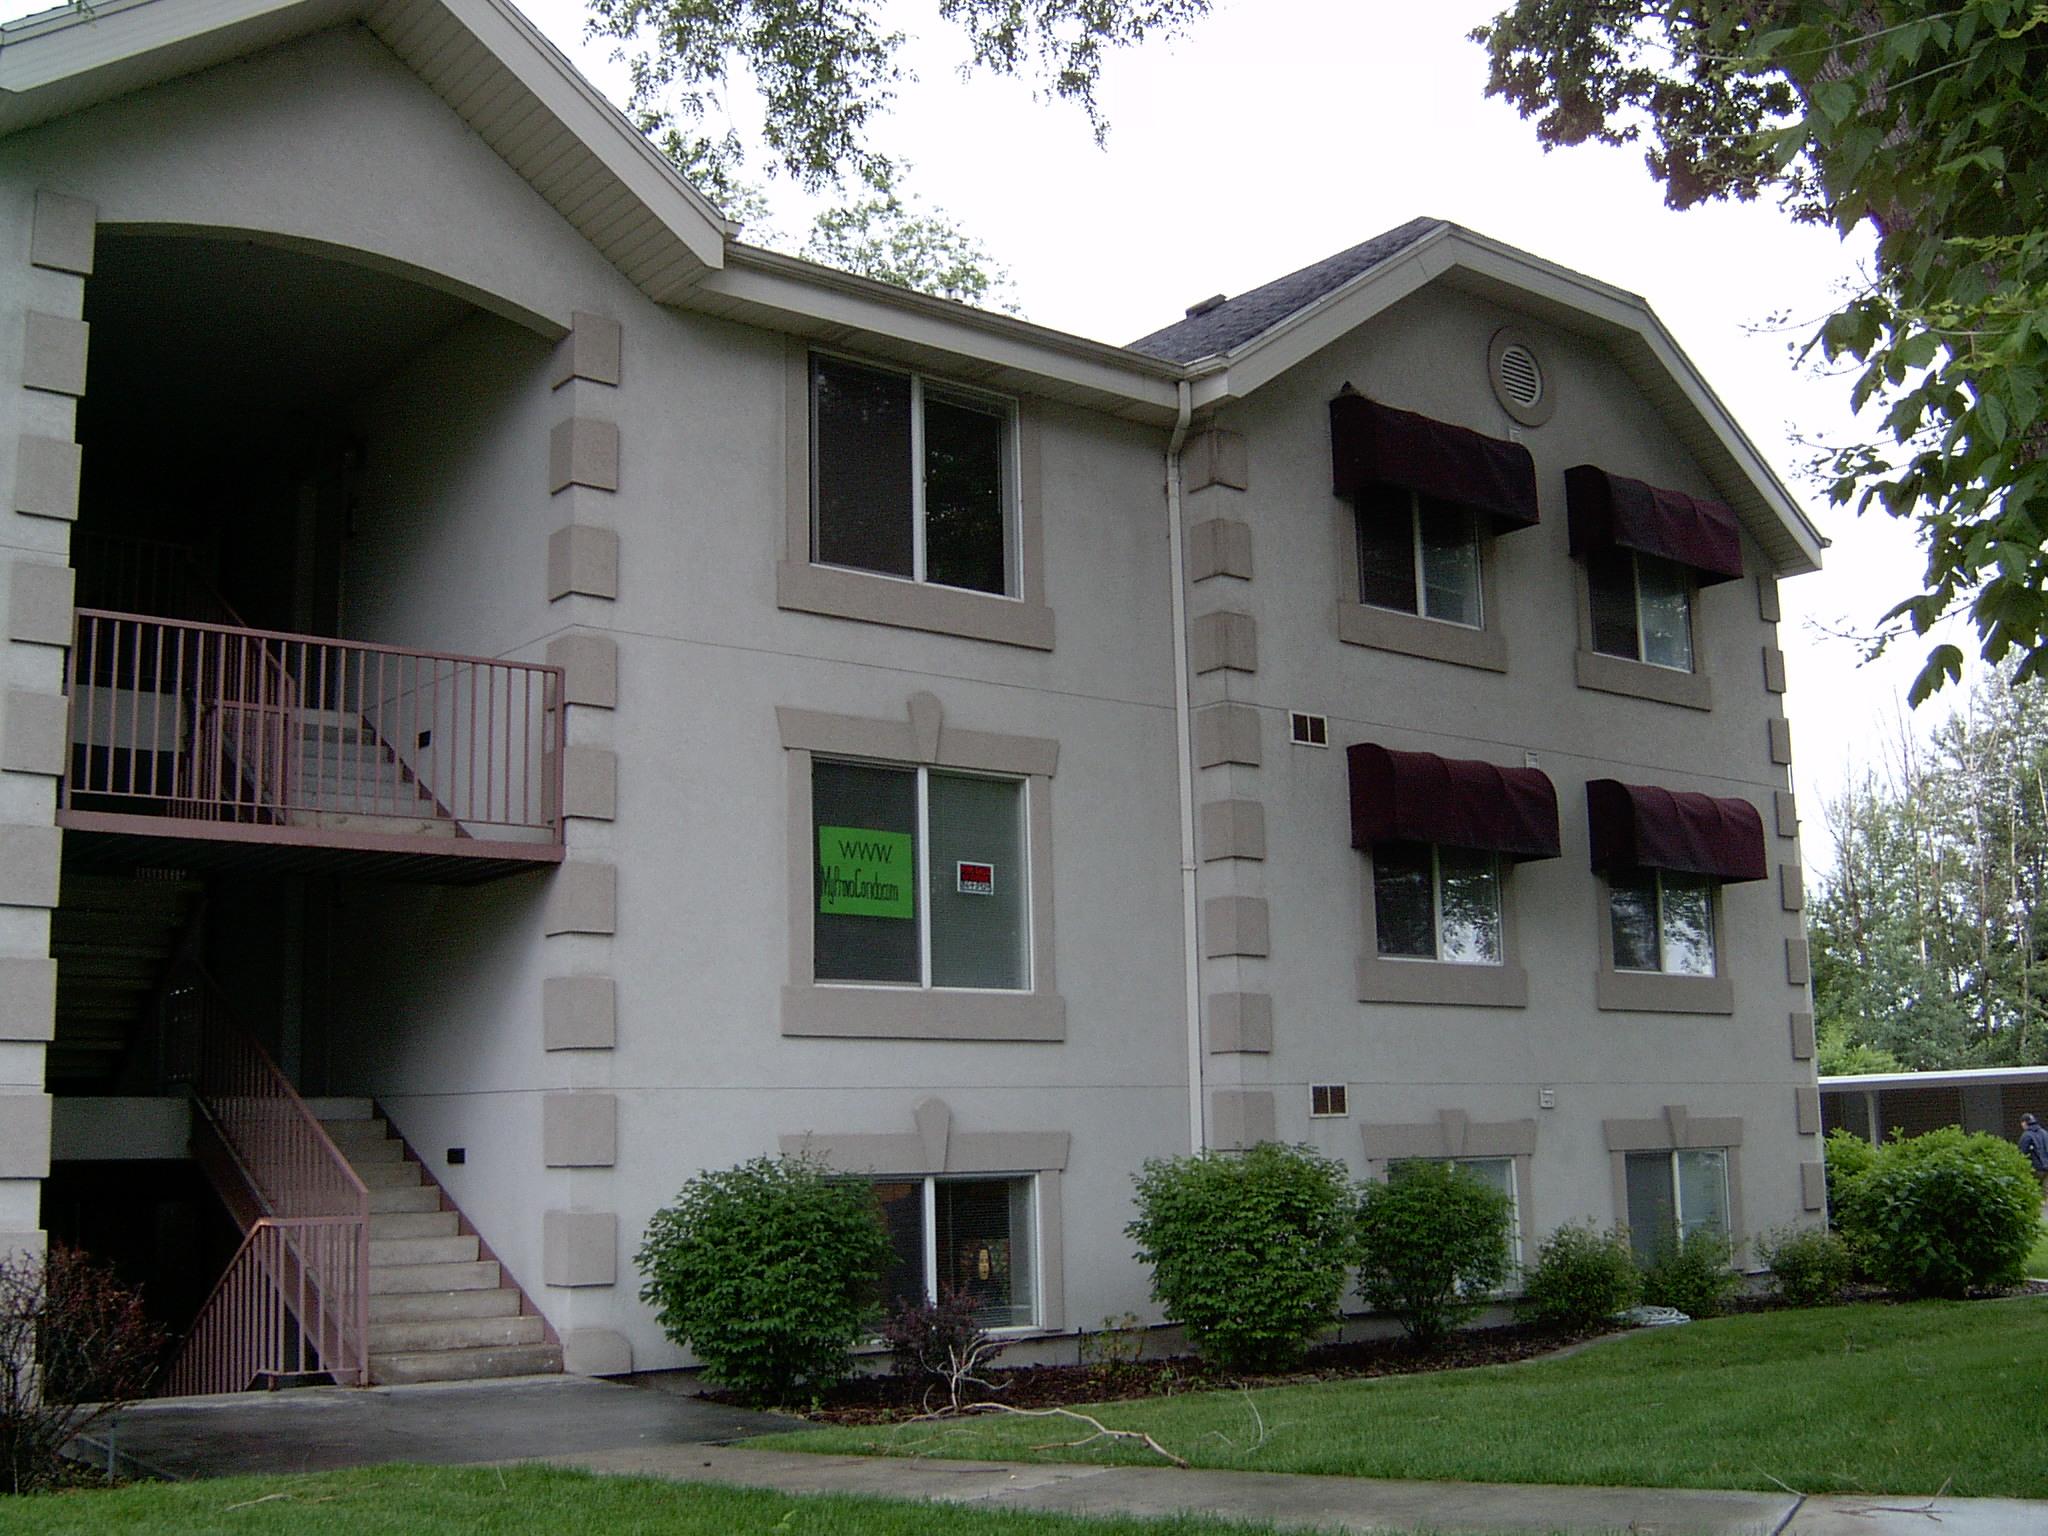 2004-1396P.JPG